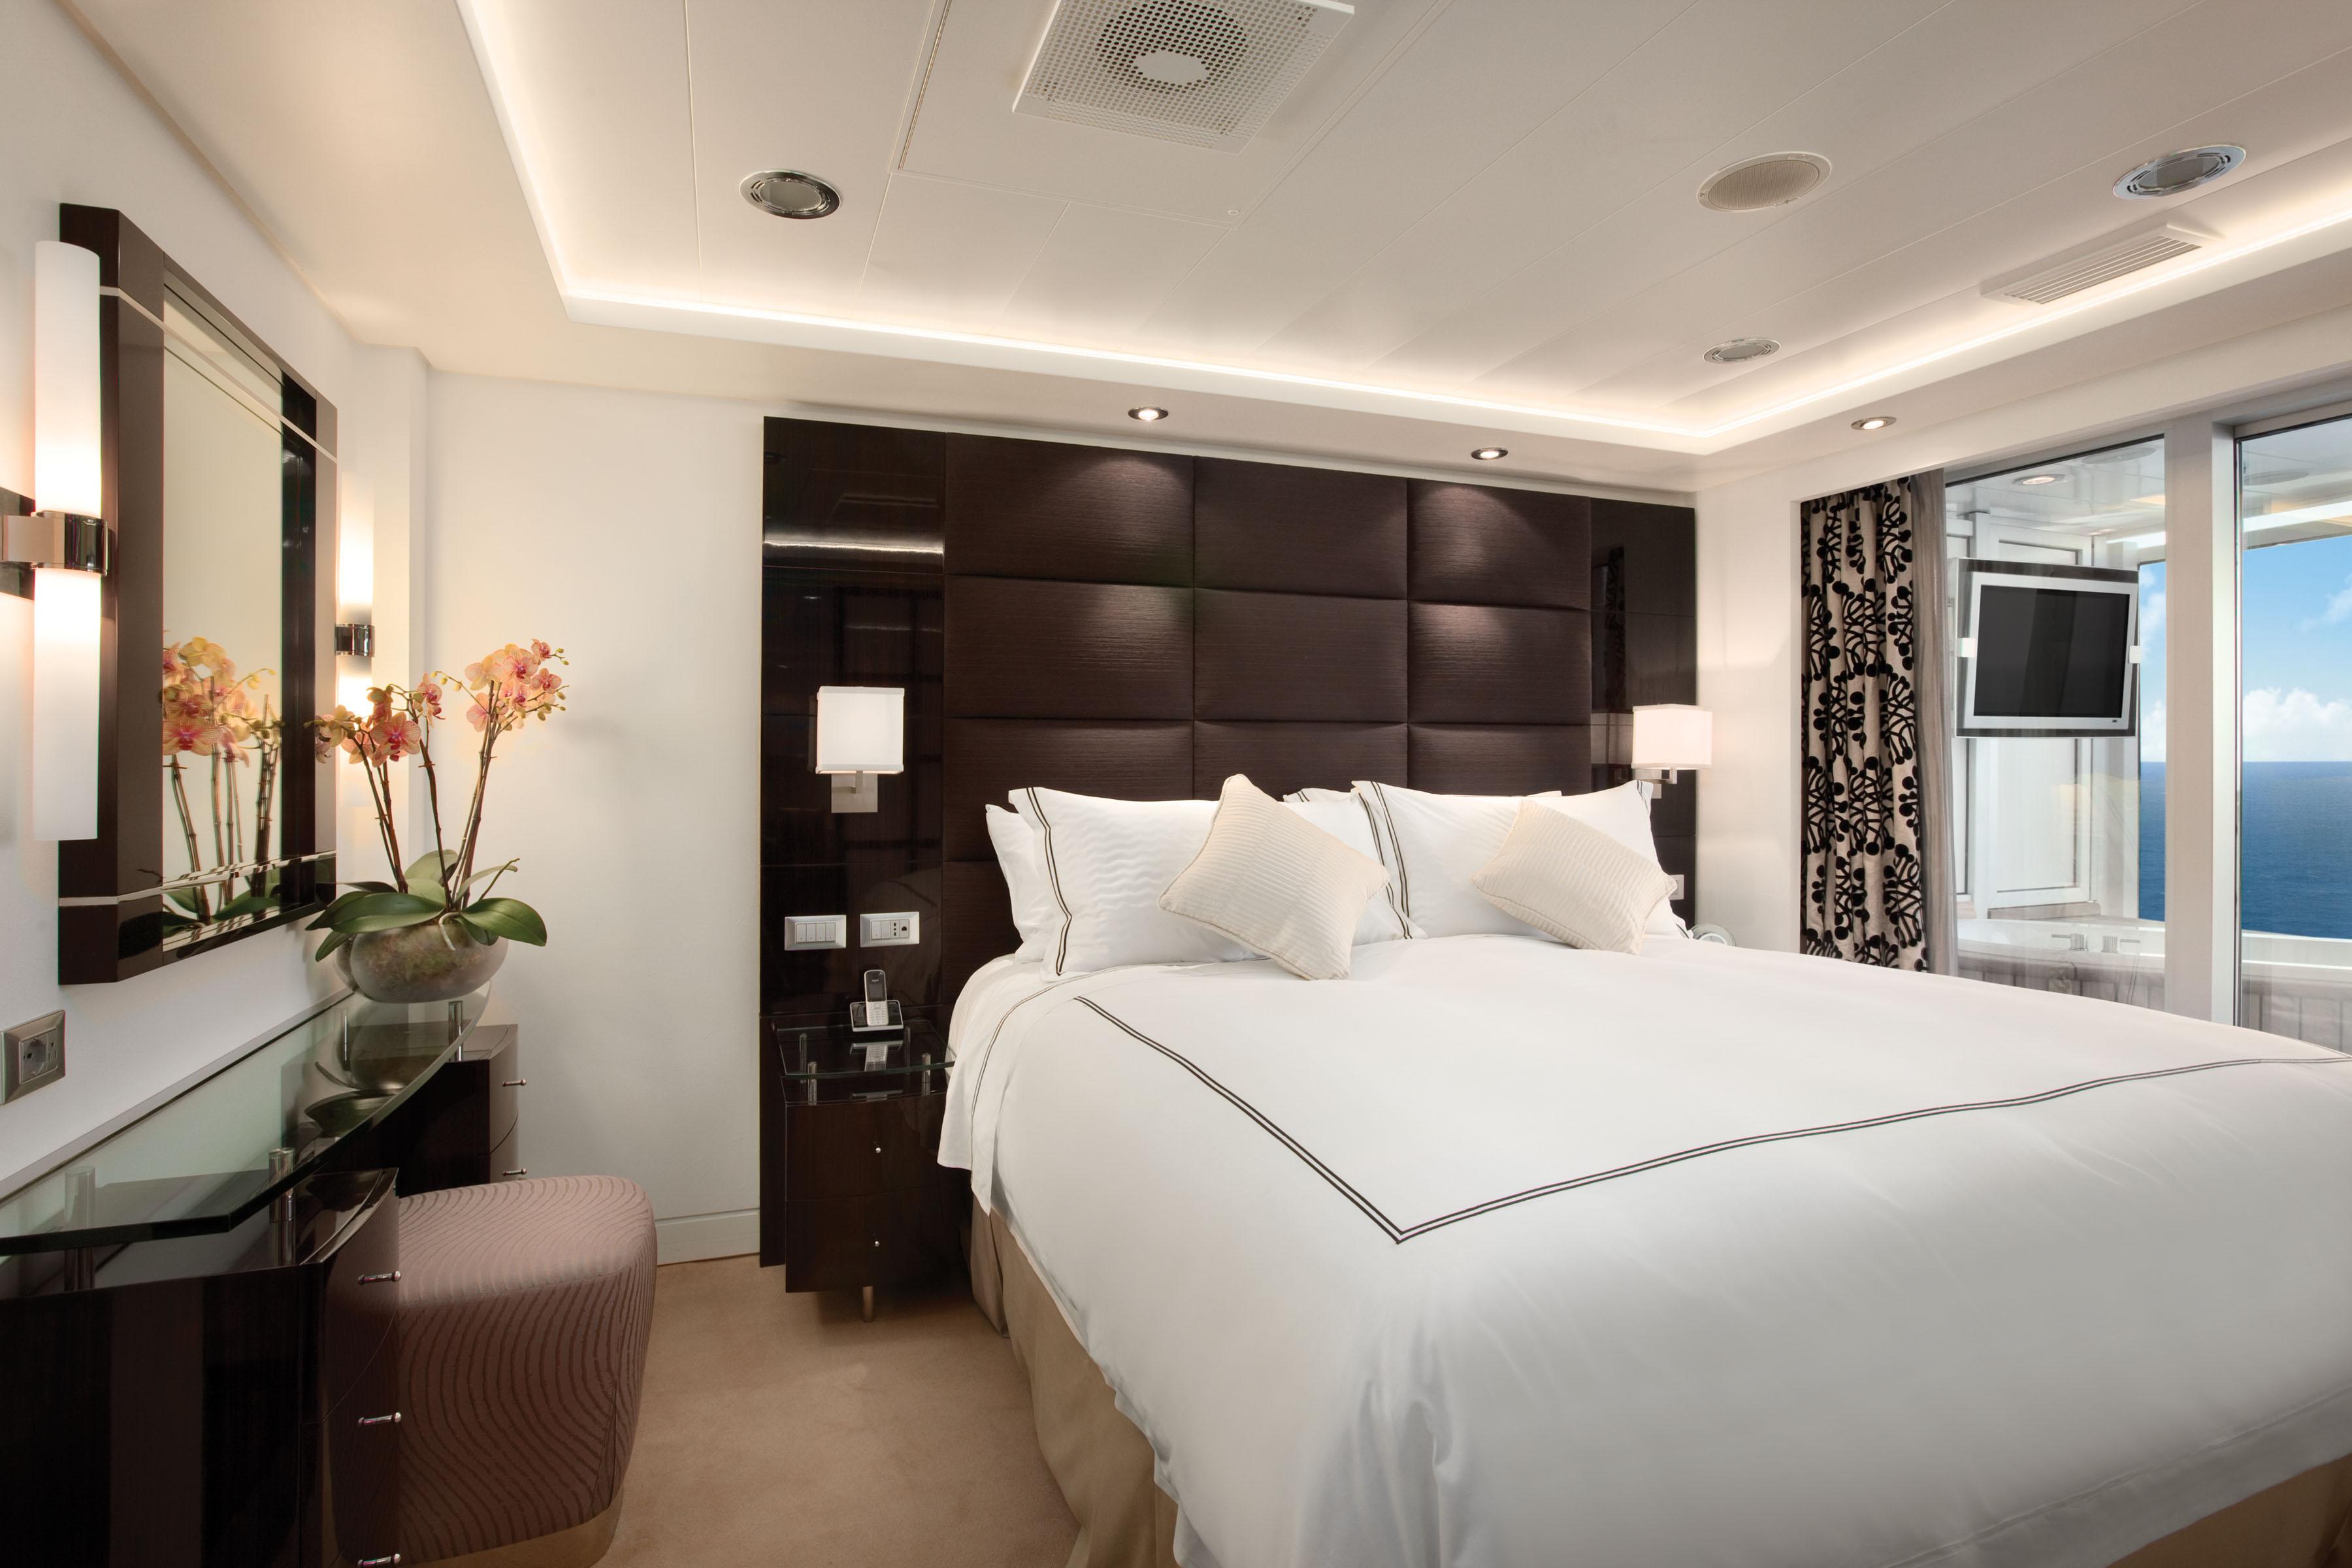 Oceania Cruises Oceania Class Accommodation Oceania Suite Bedroom.jpg